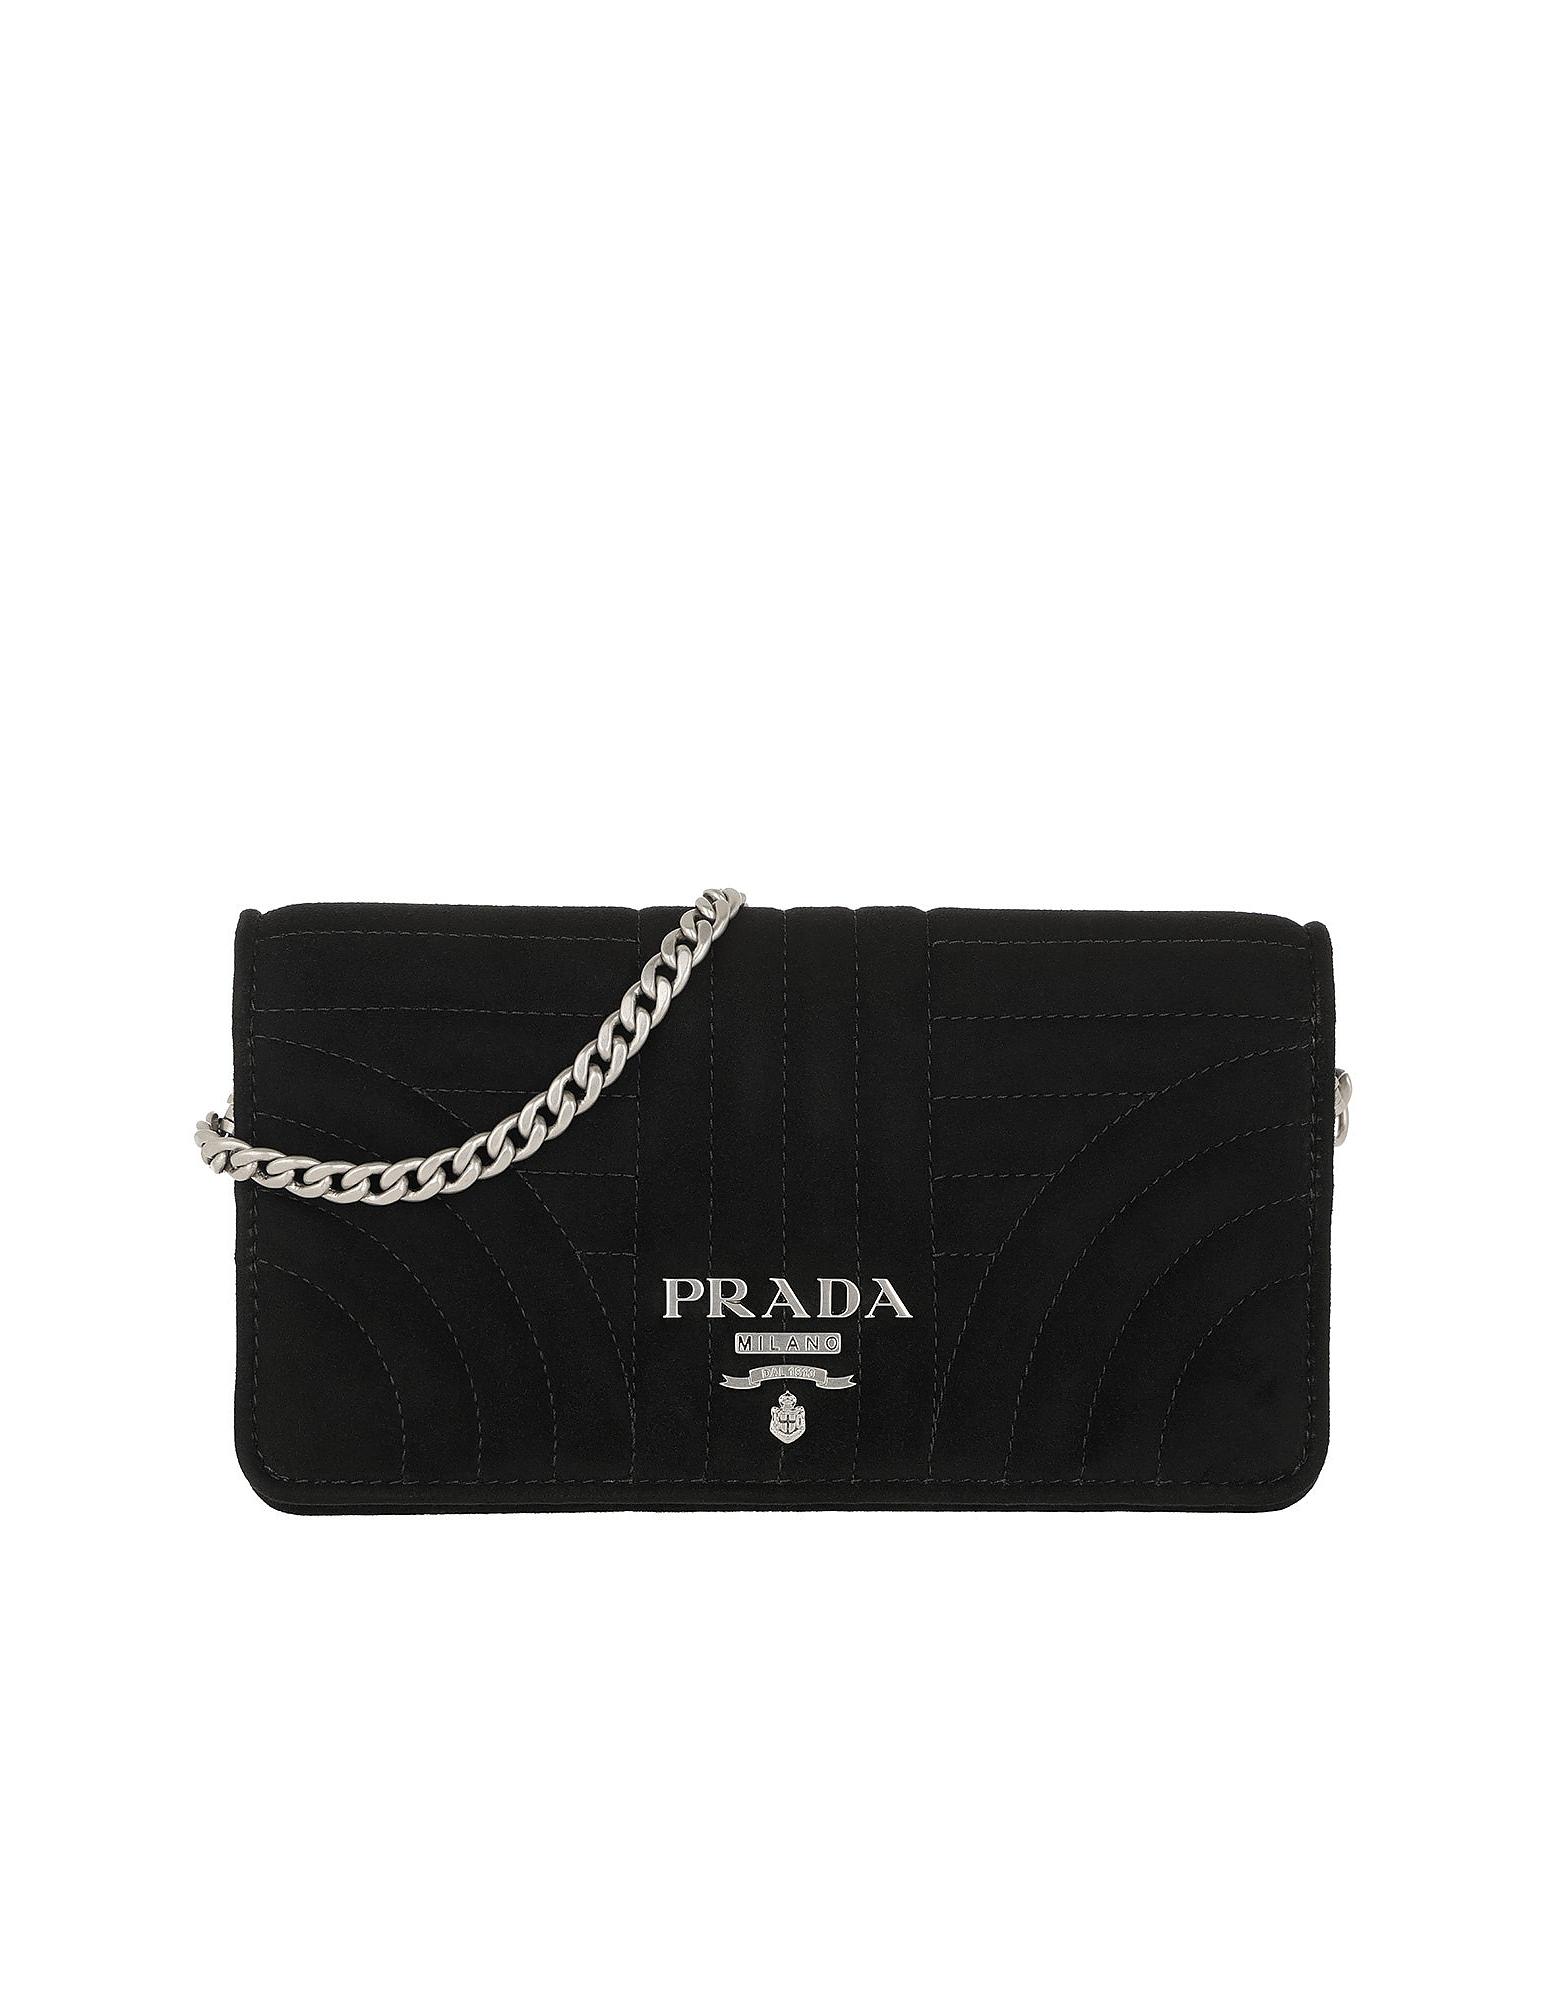 8f092ad285e5 Prada Mini Crossbody Bag Quilted Leather Black | ModeSens